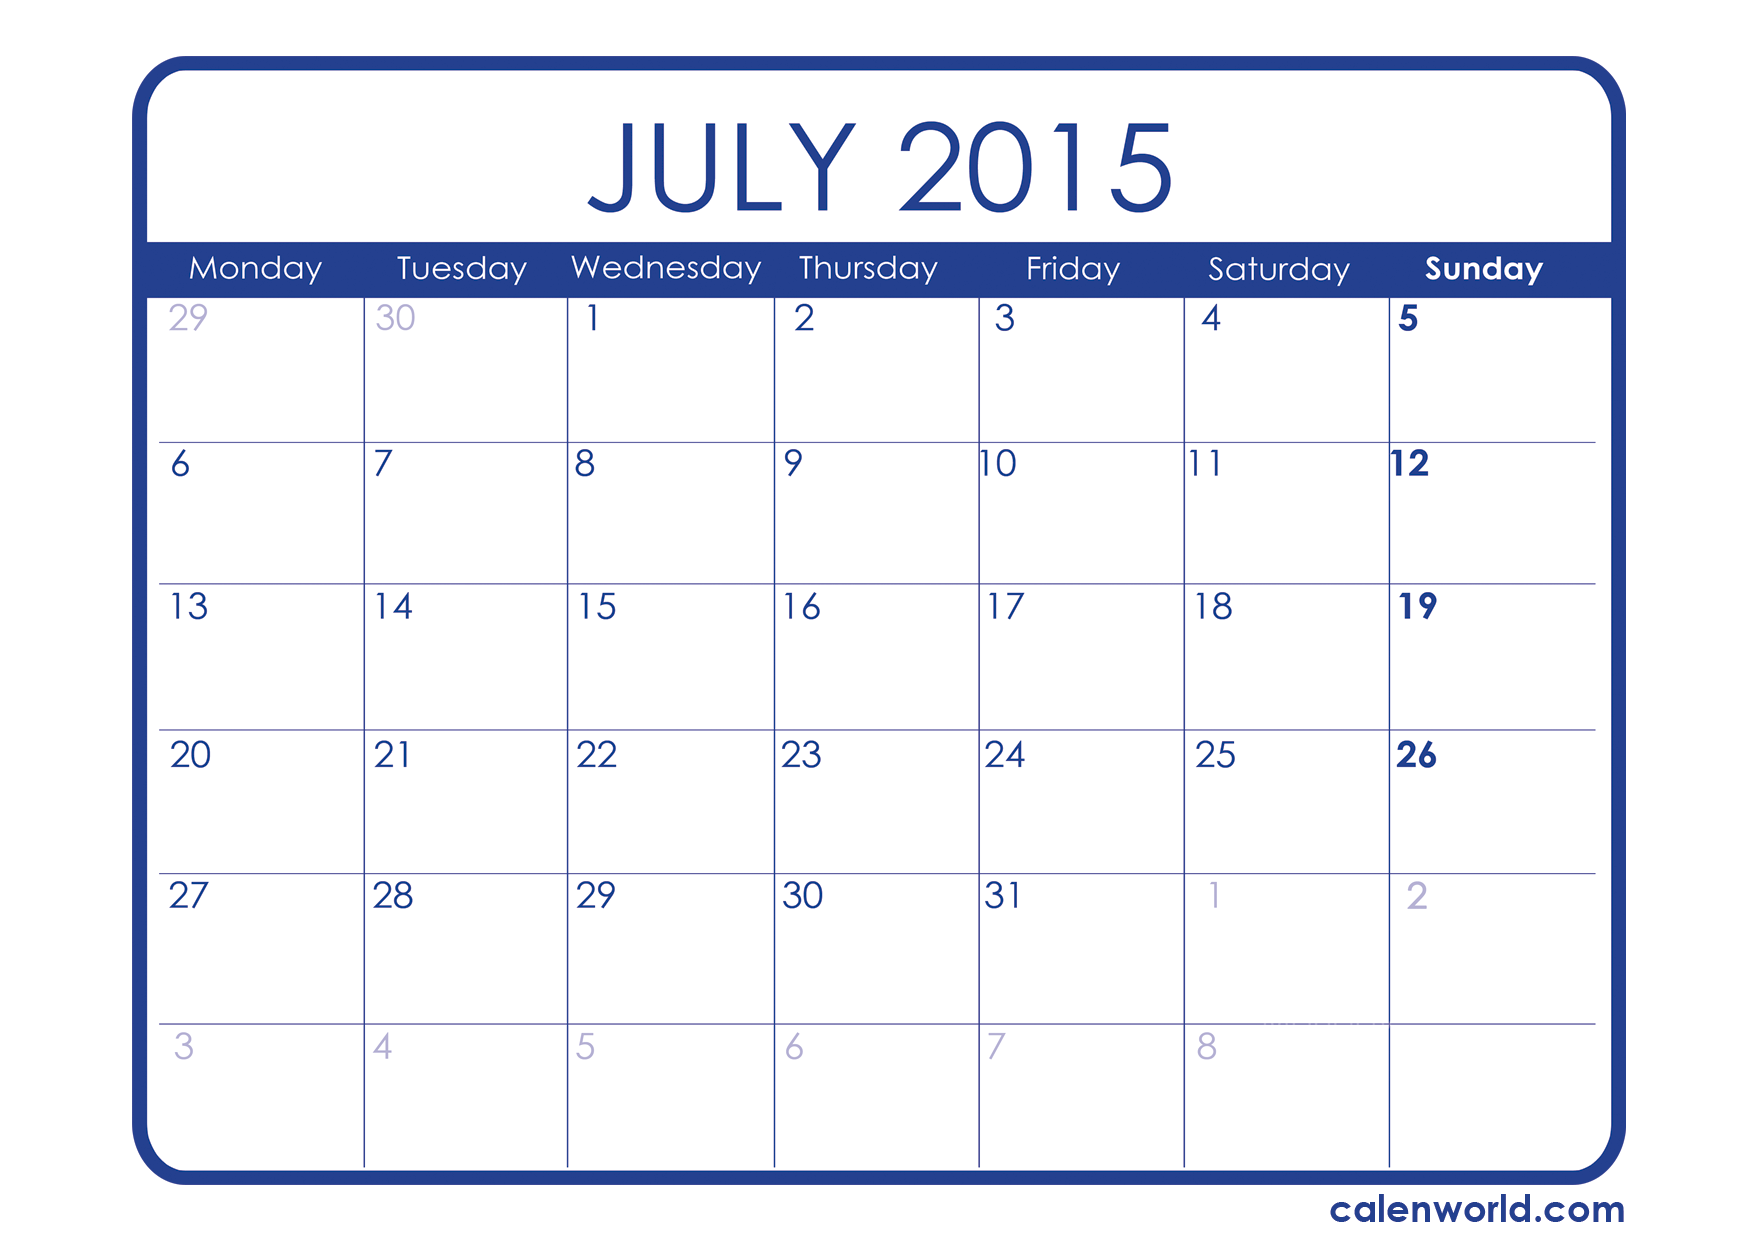 July 2015 Calendar In Excel Printable July 2015 Calendar Template Planner Organization Blogger Tips Blog Planner